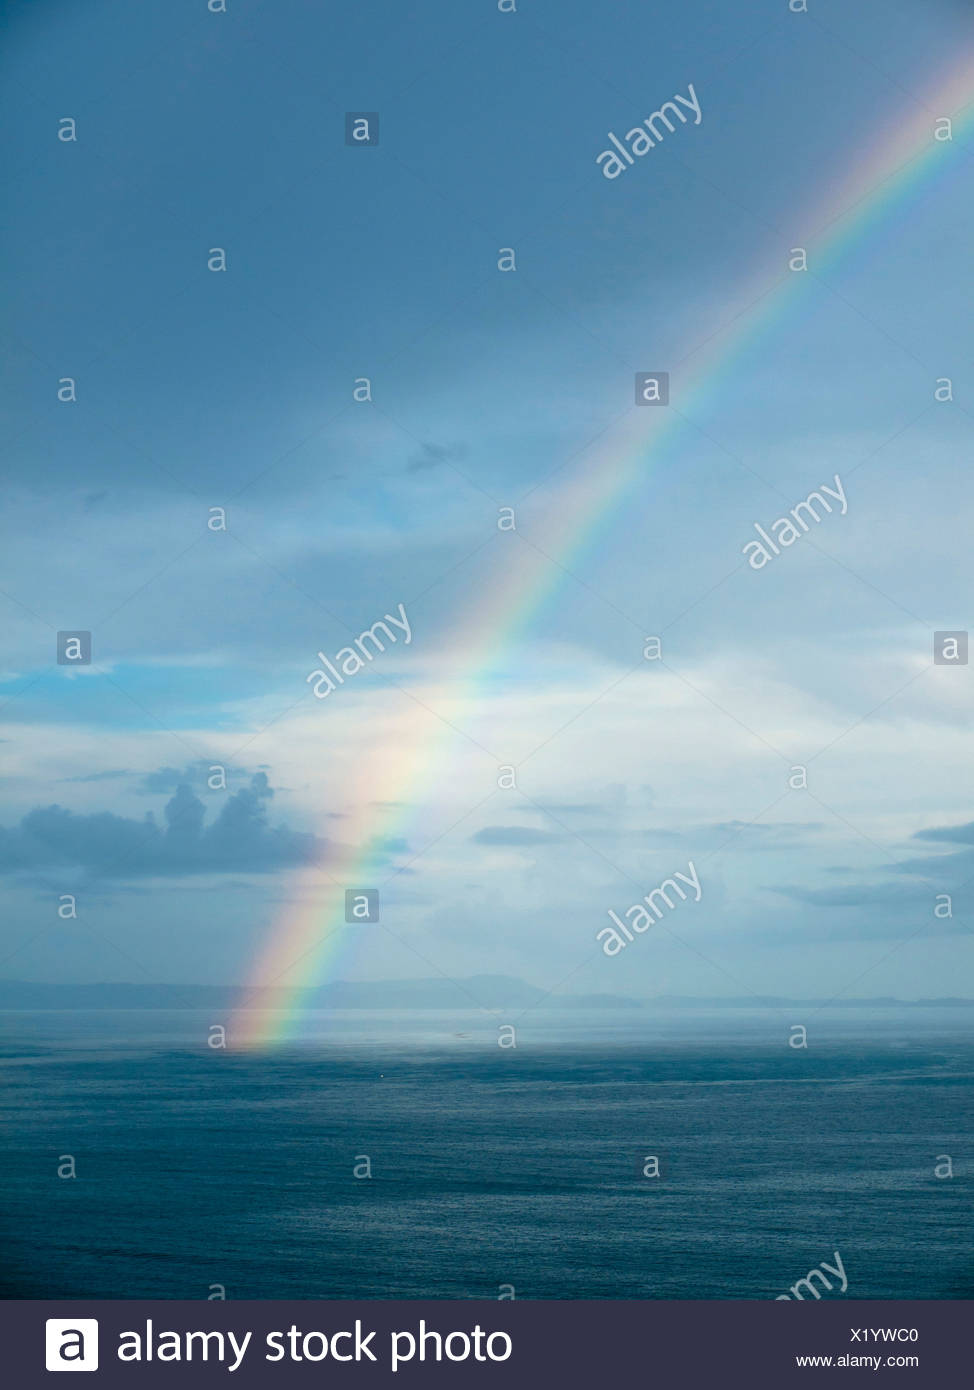 Southern Italy, Amalfi Coast, Piano di Sorrento, View of beautiful rainbow in sea at dawn - Stock Image